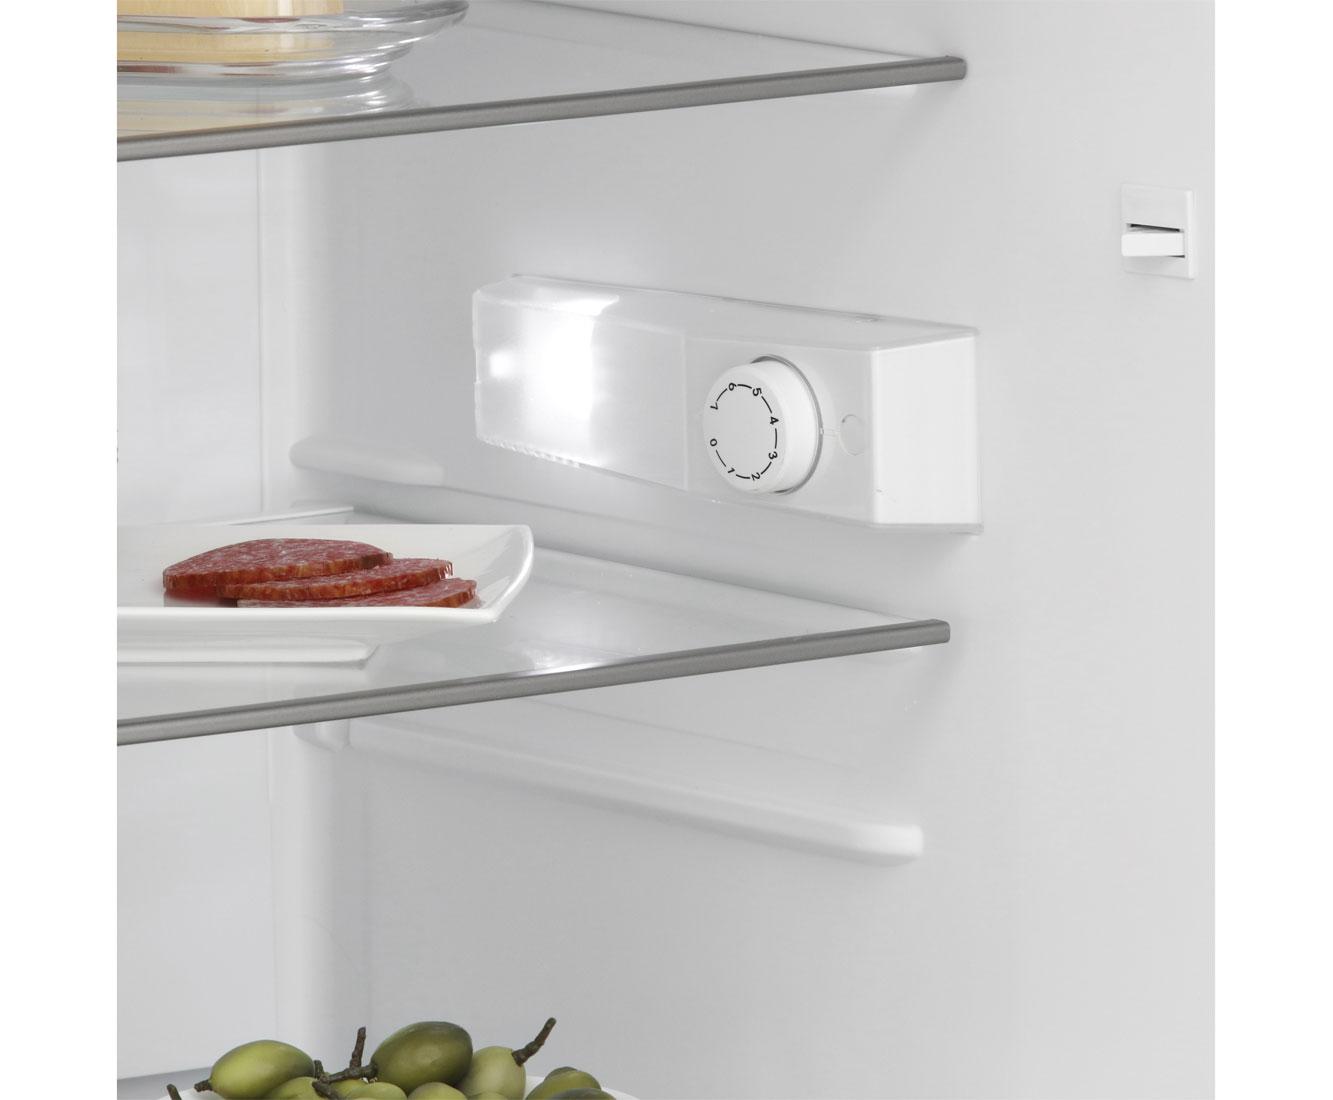 Bomann Kühlschrank Bewertung : Bomann vs kühlschrank weiß a